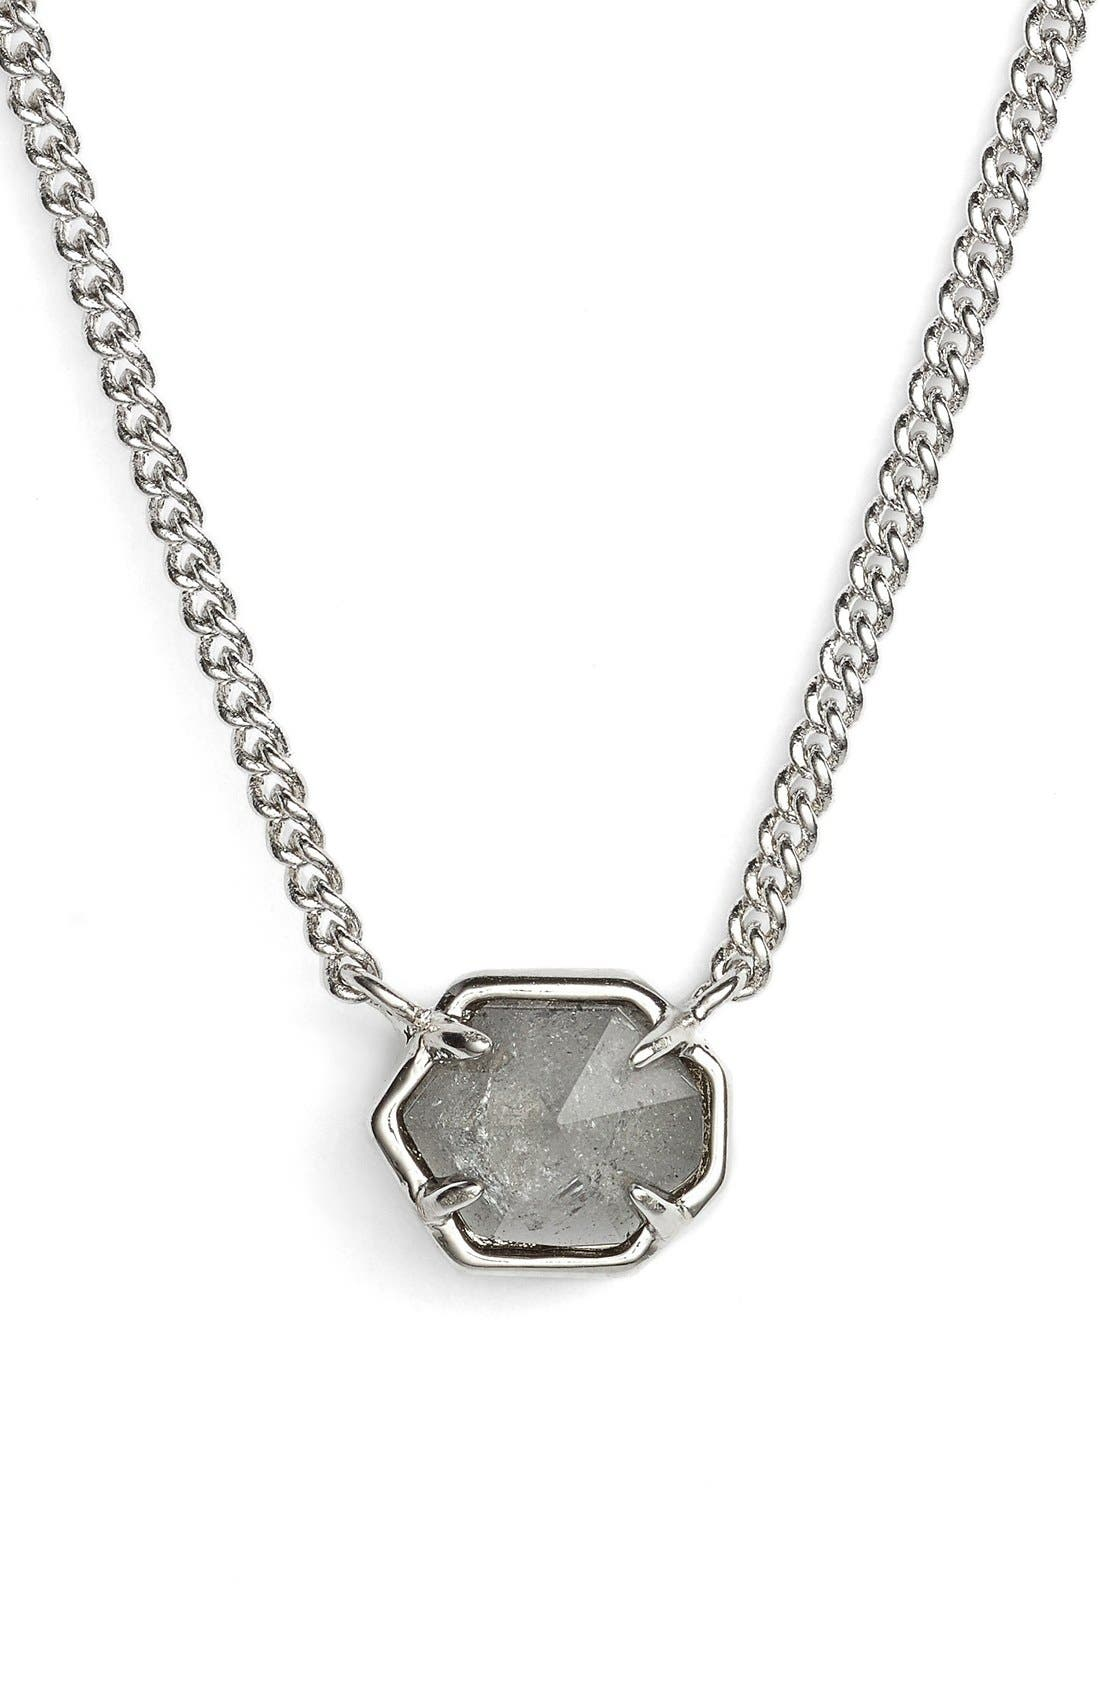 Alternate Image 1 Selected - Kendra Scott 'Mabel' Necklace